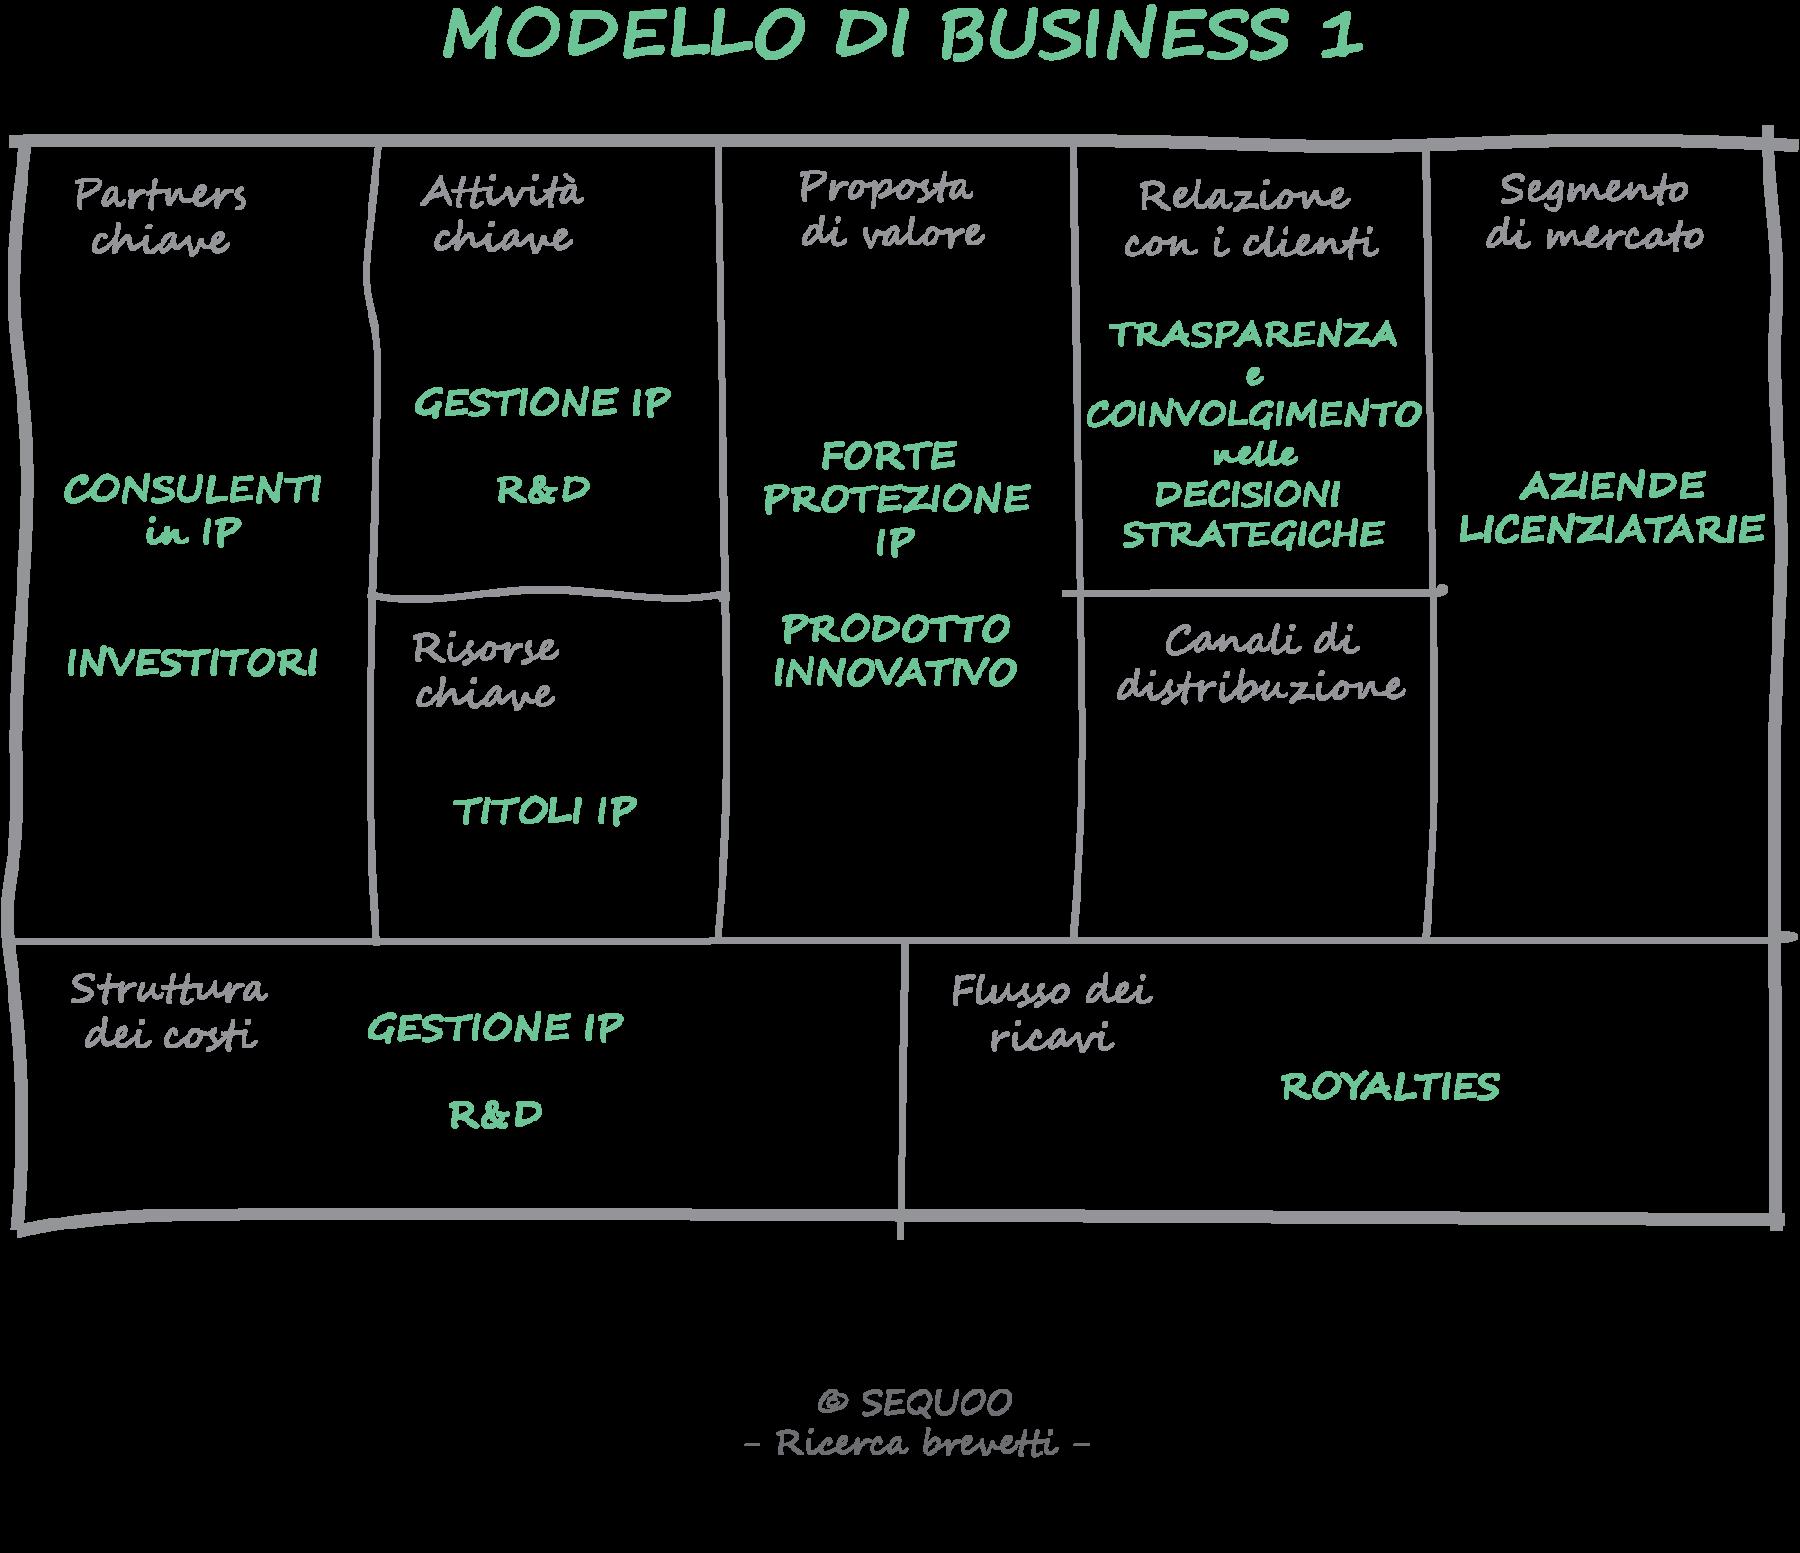 modello-business-1-sequoo